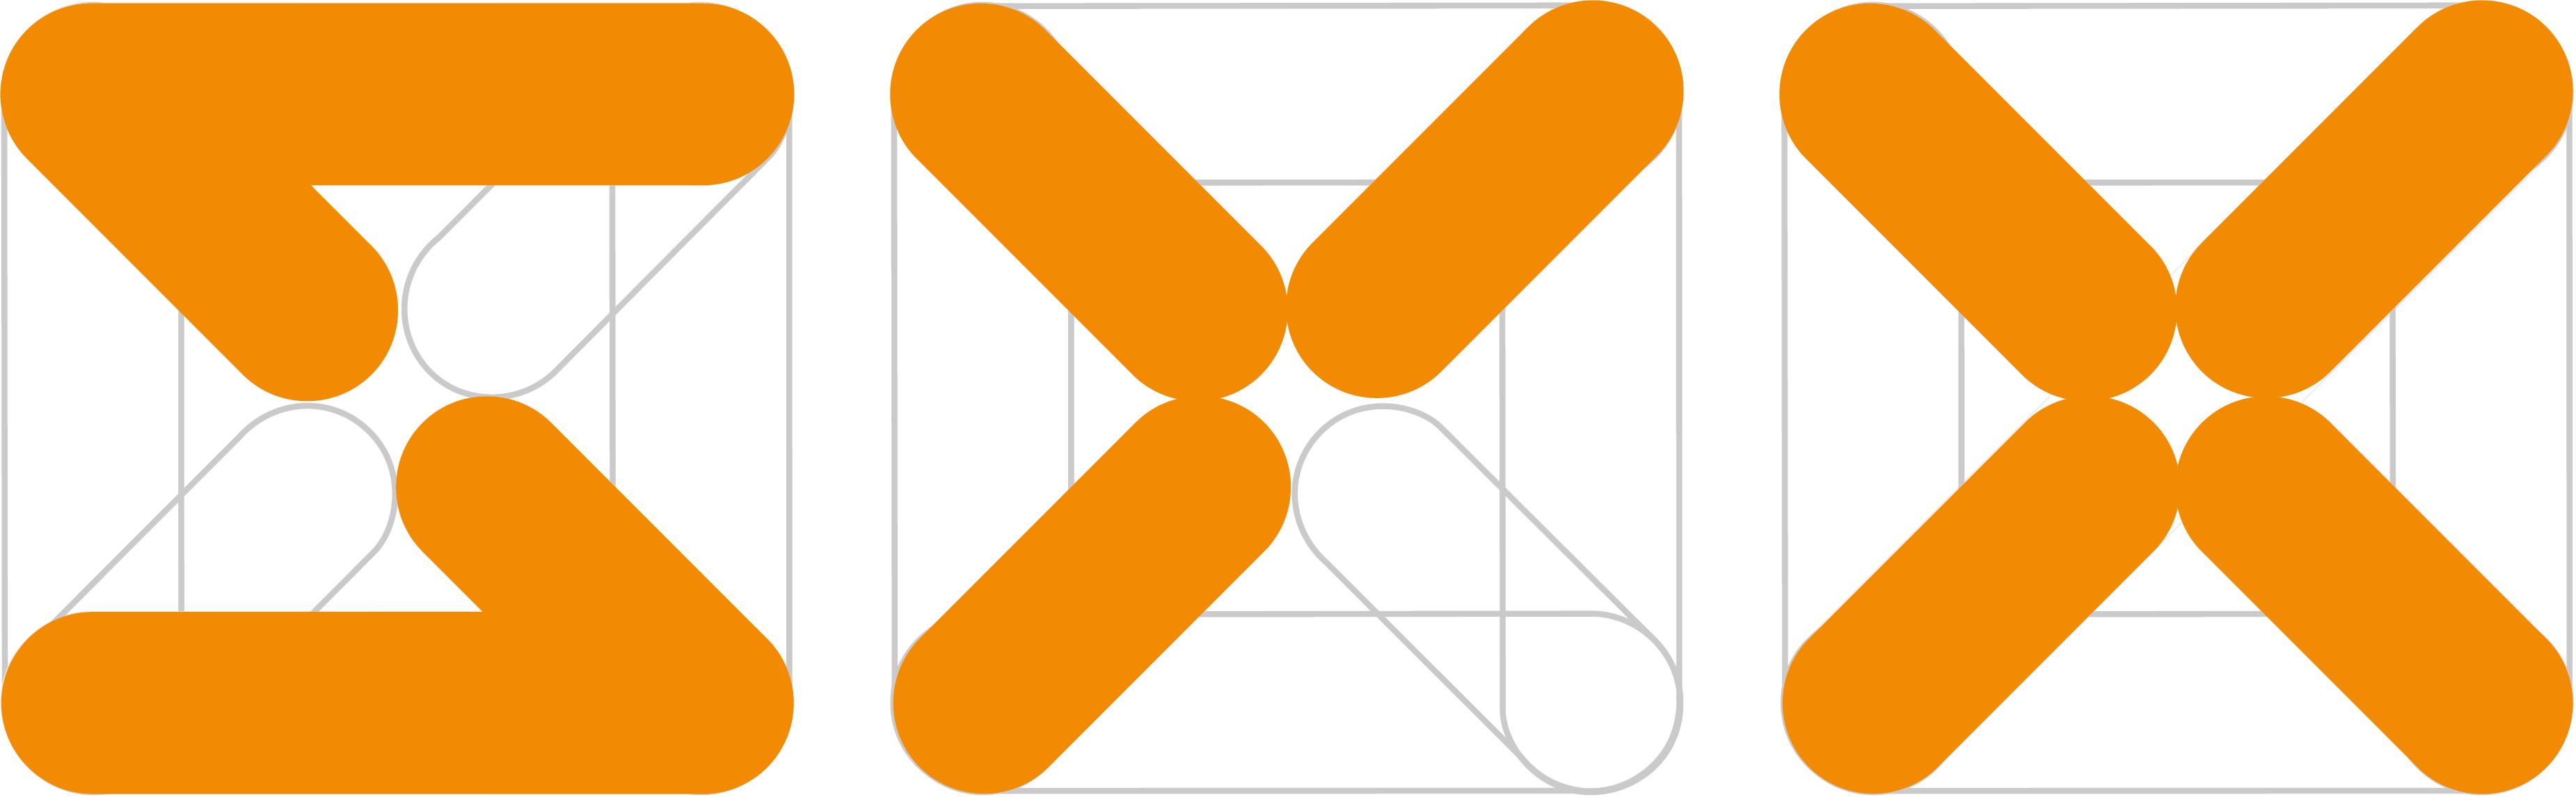 logo syx